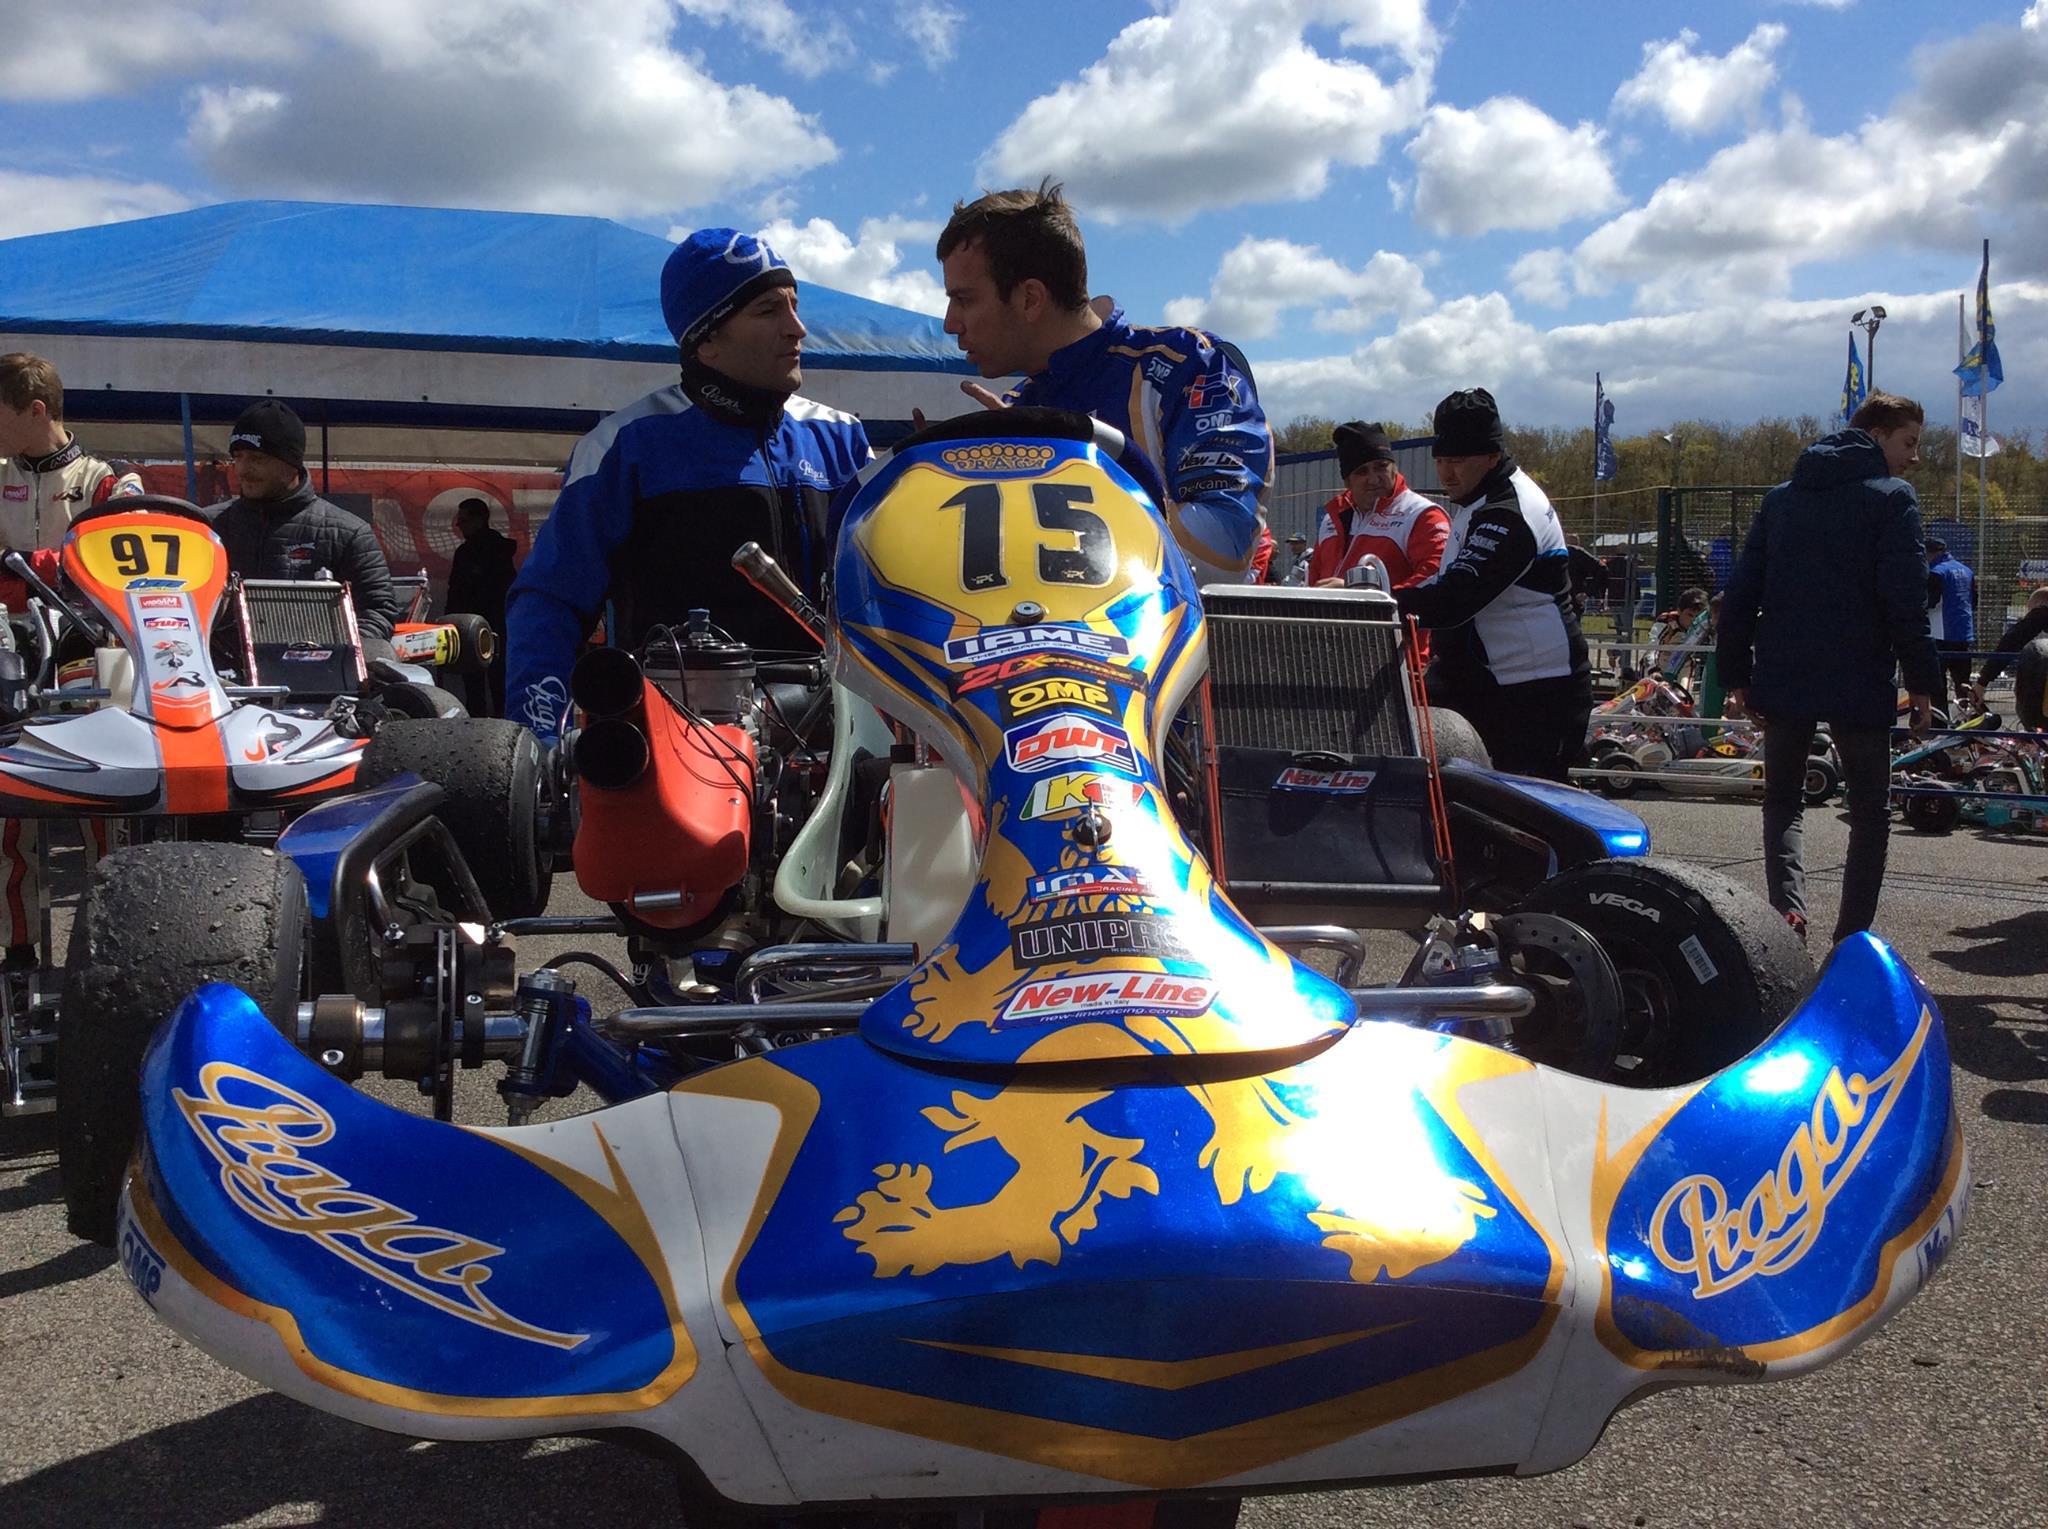 CIK-FIA European KZ & KZ2 Championship Round 1 at Essay, France